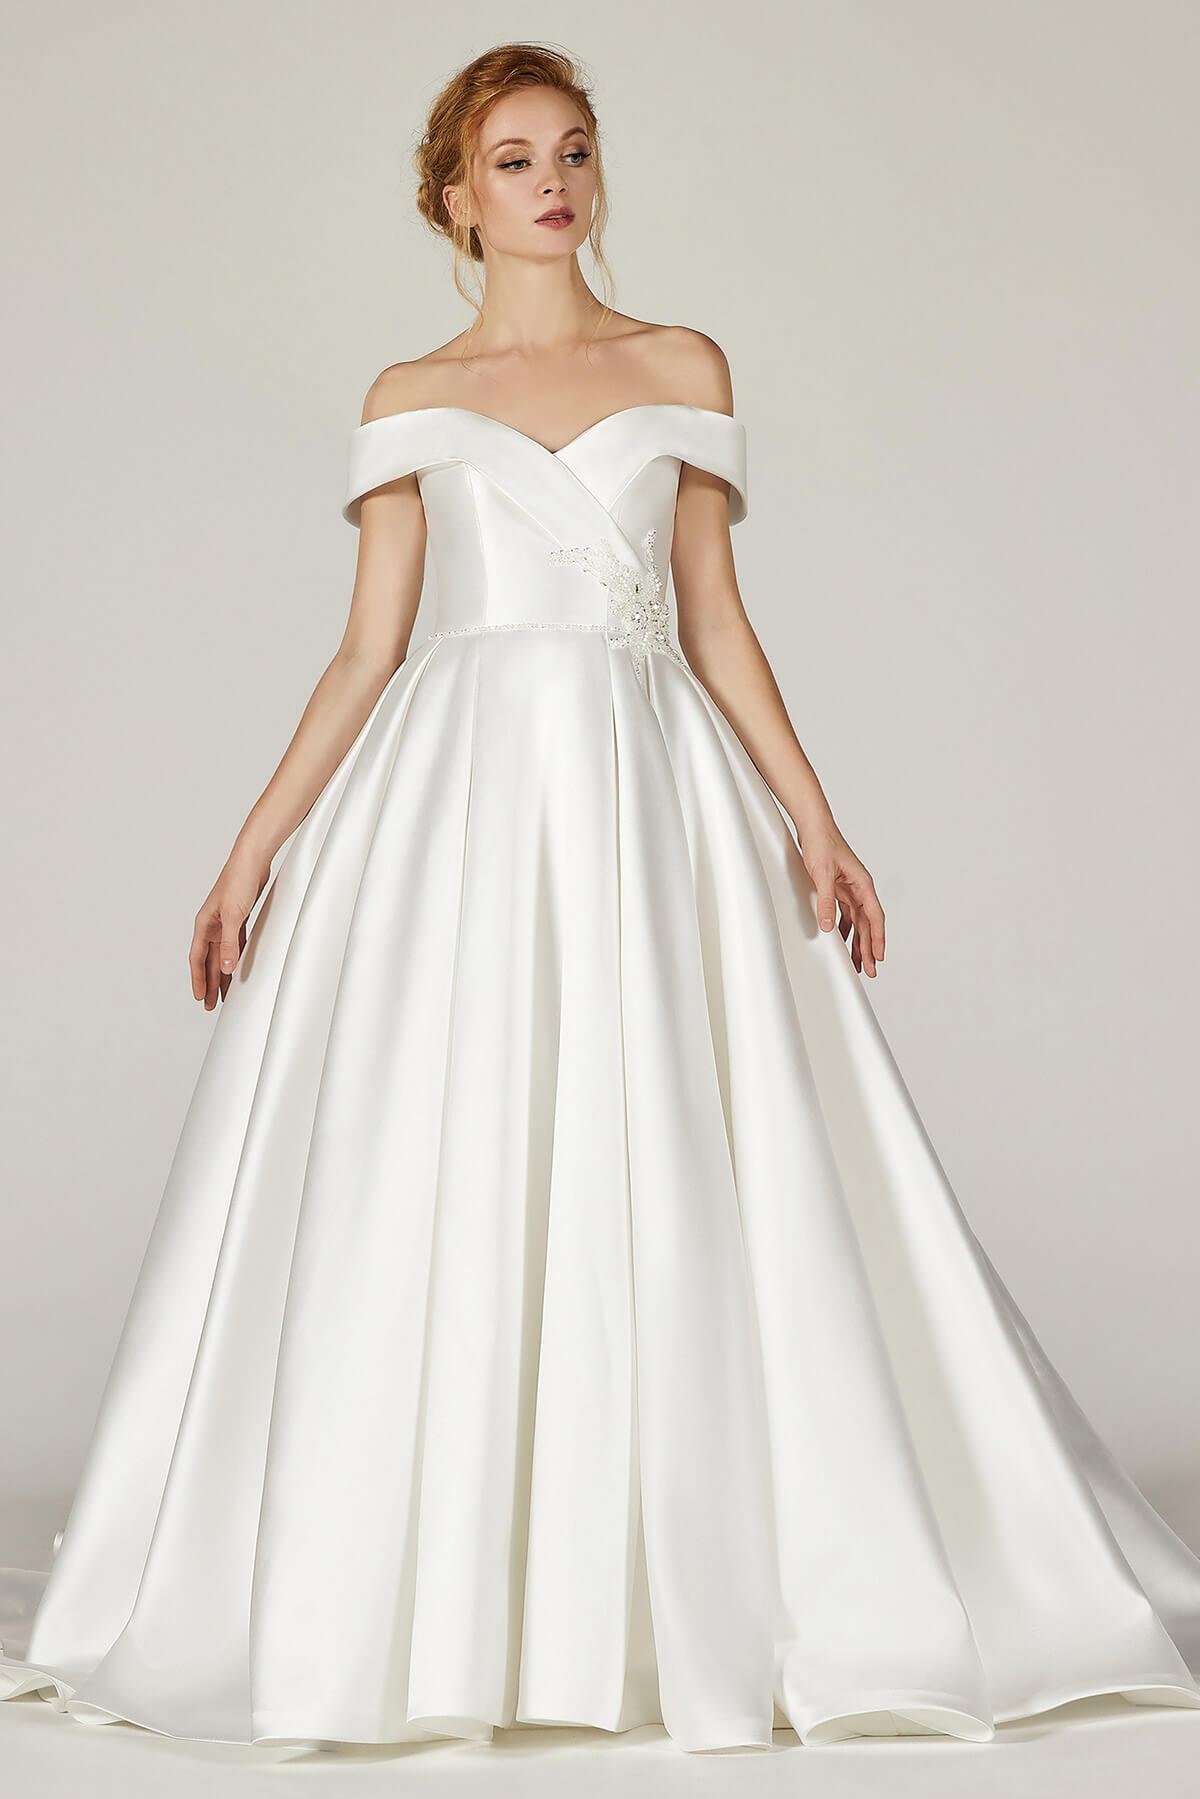 Cocomelody Black Wedding Dress List - CW2289